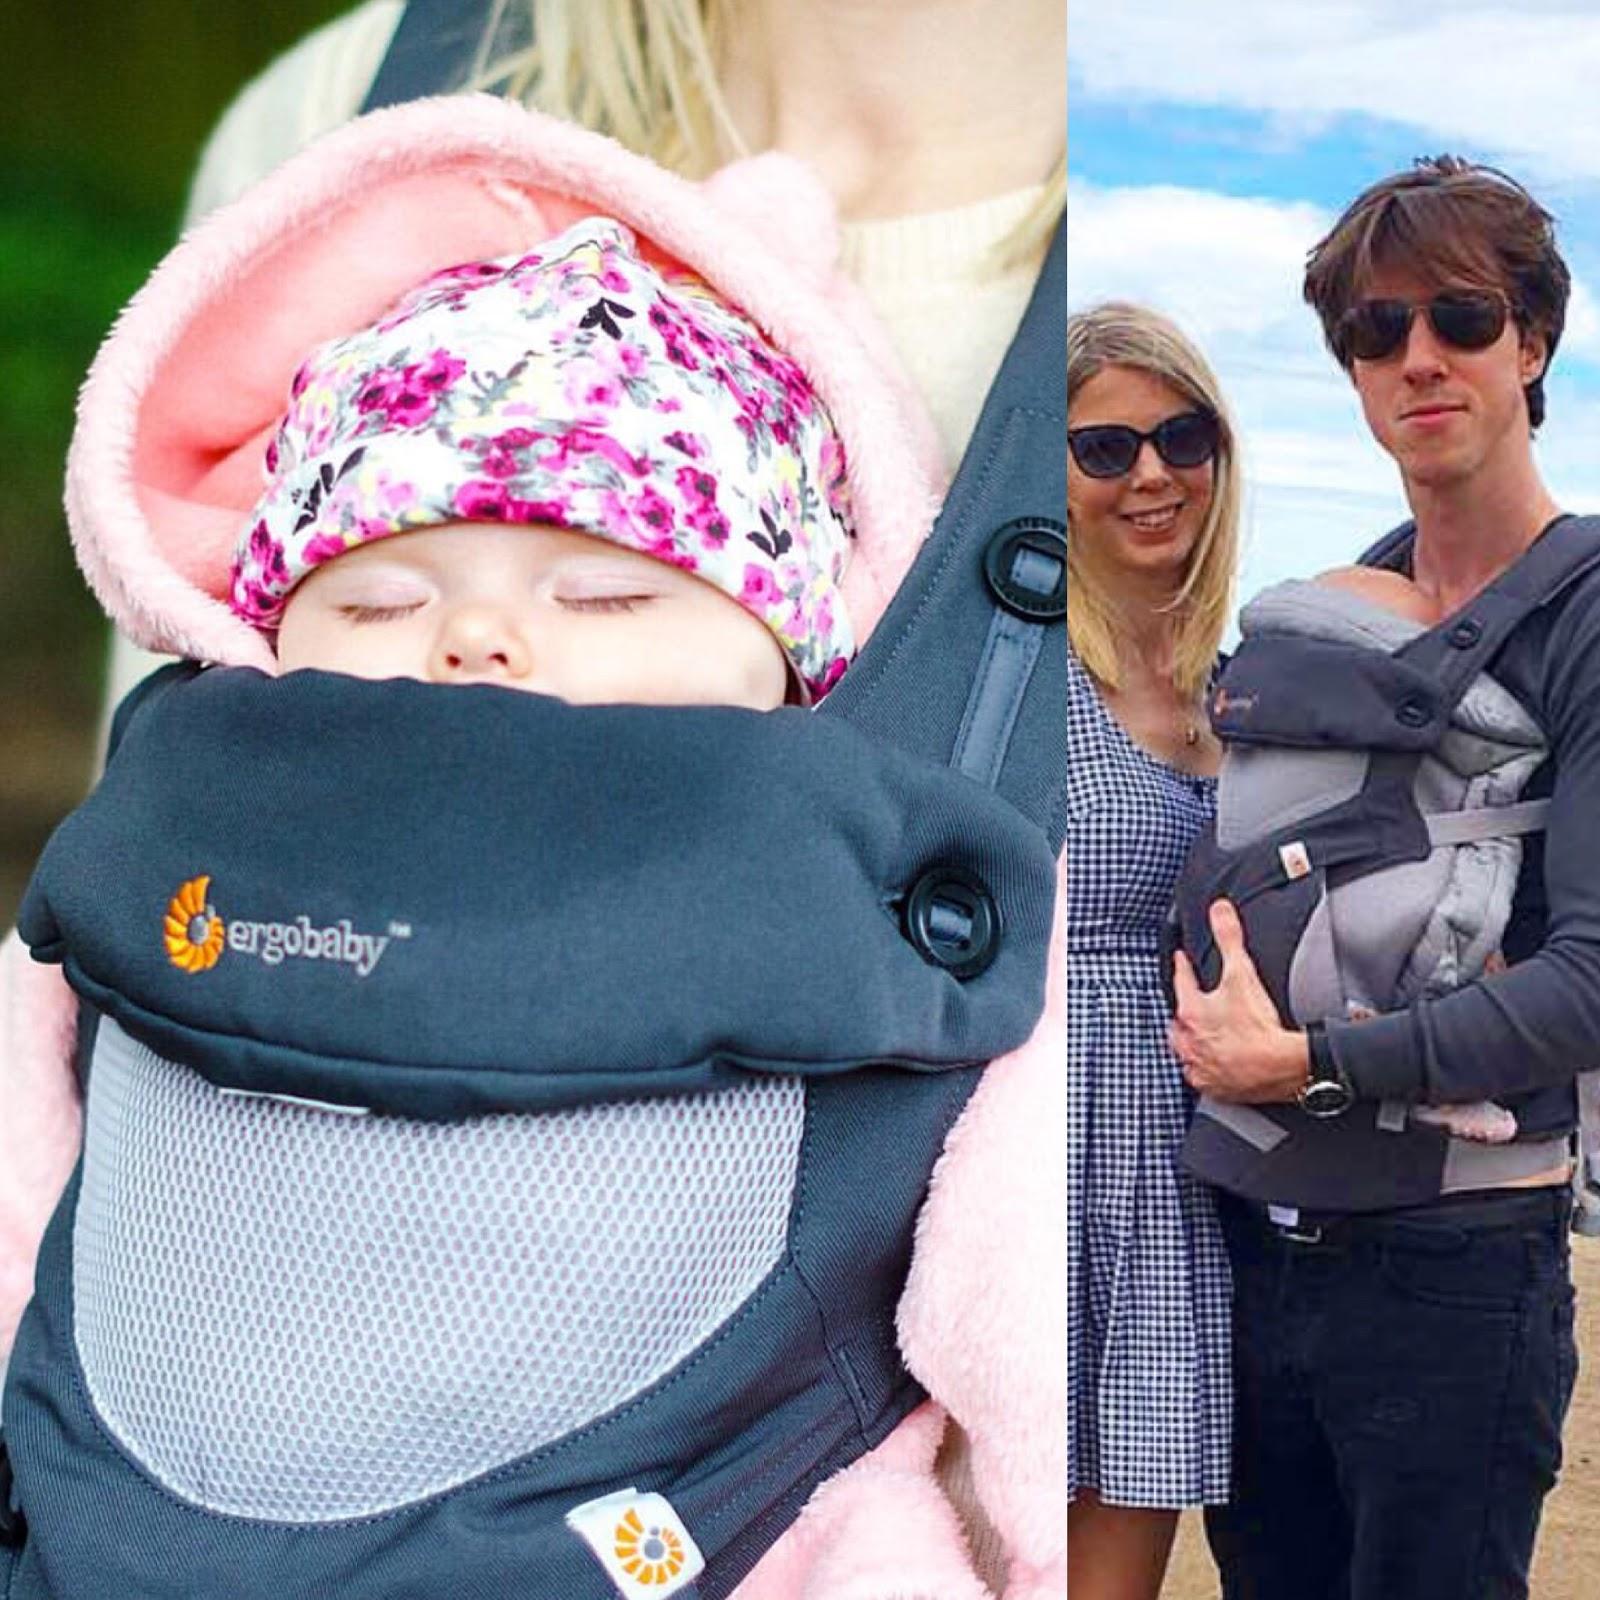 New Mum's Christmas Gift List & Baby Registry 2016